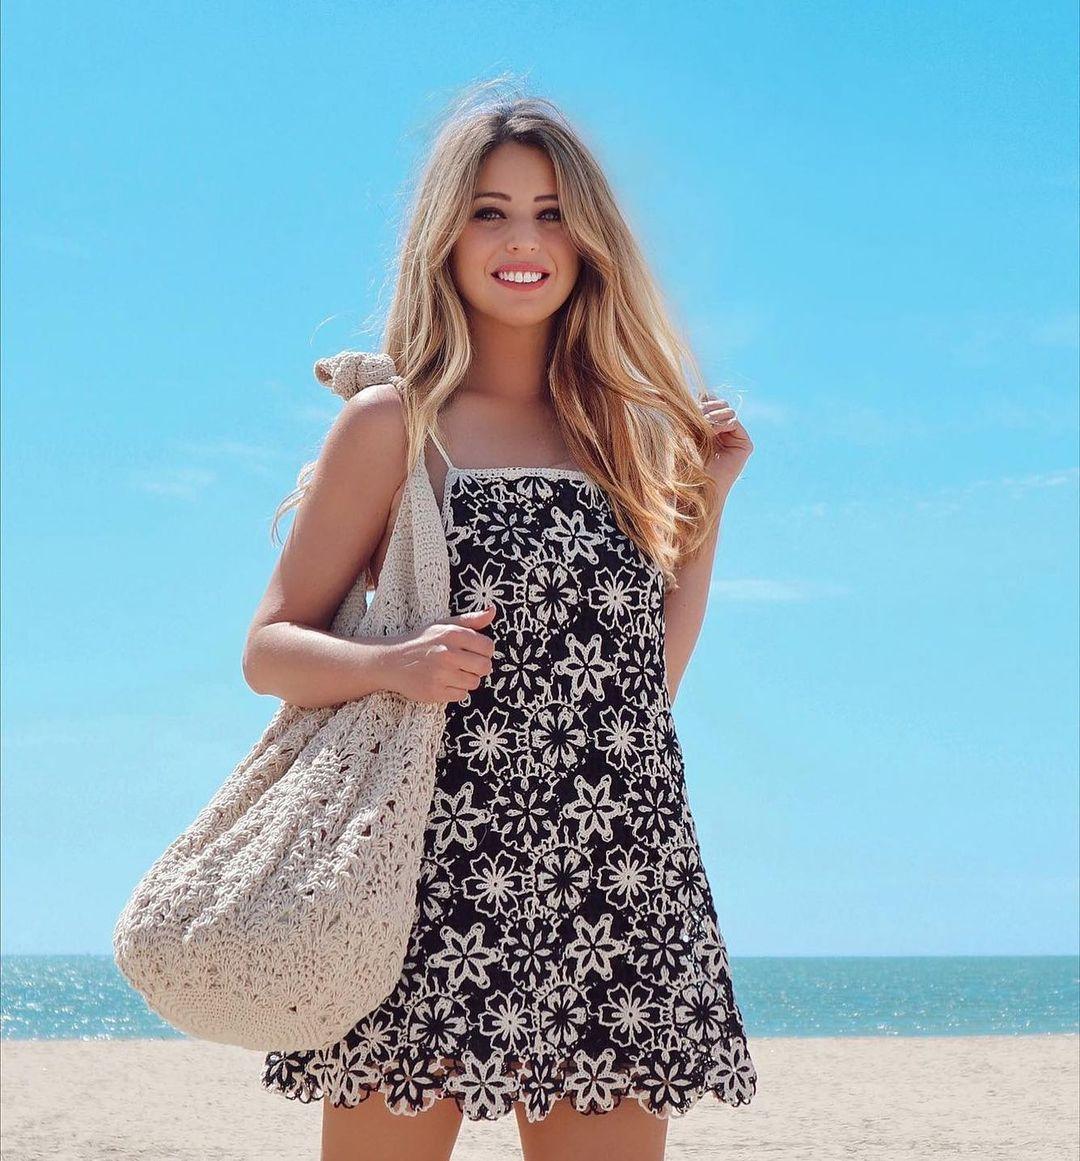 crocheted short dress de Zara sur zaradiccion__